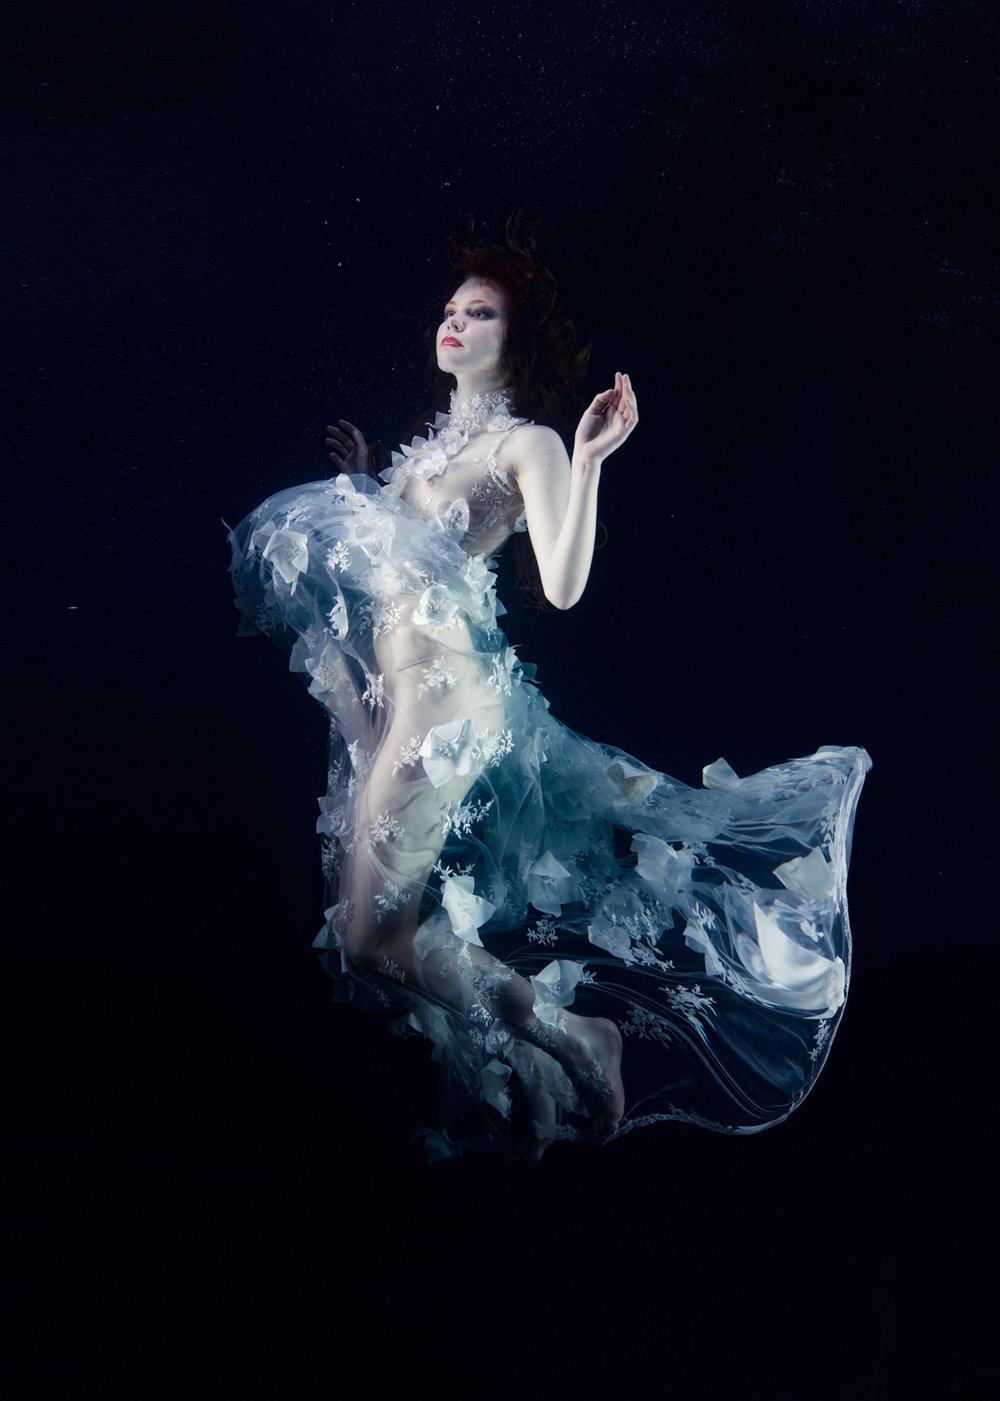 161018 Moaqna Underwater 192-Edit.jpg